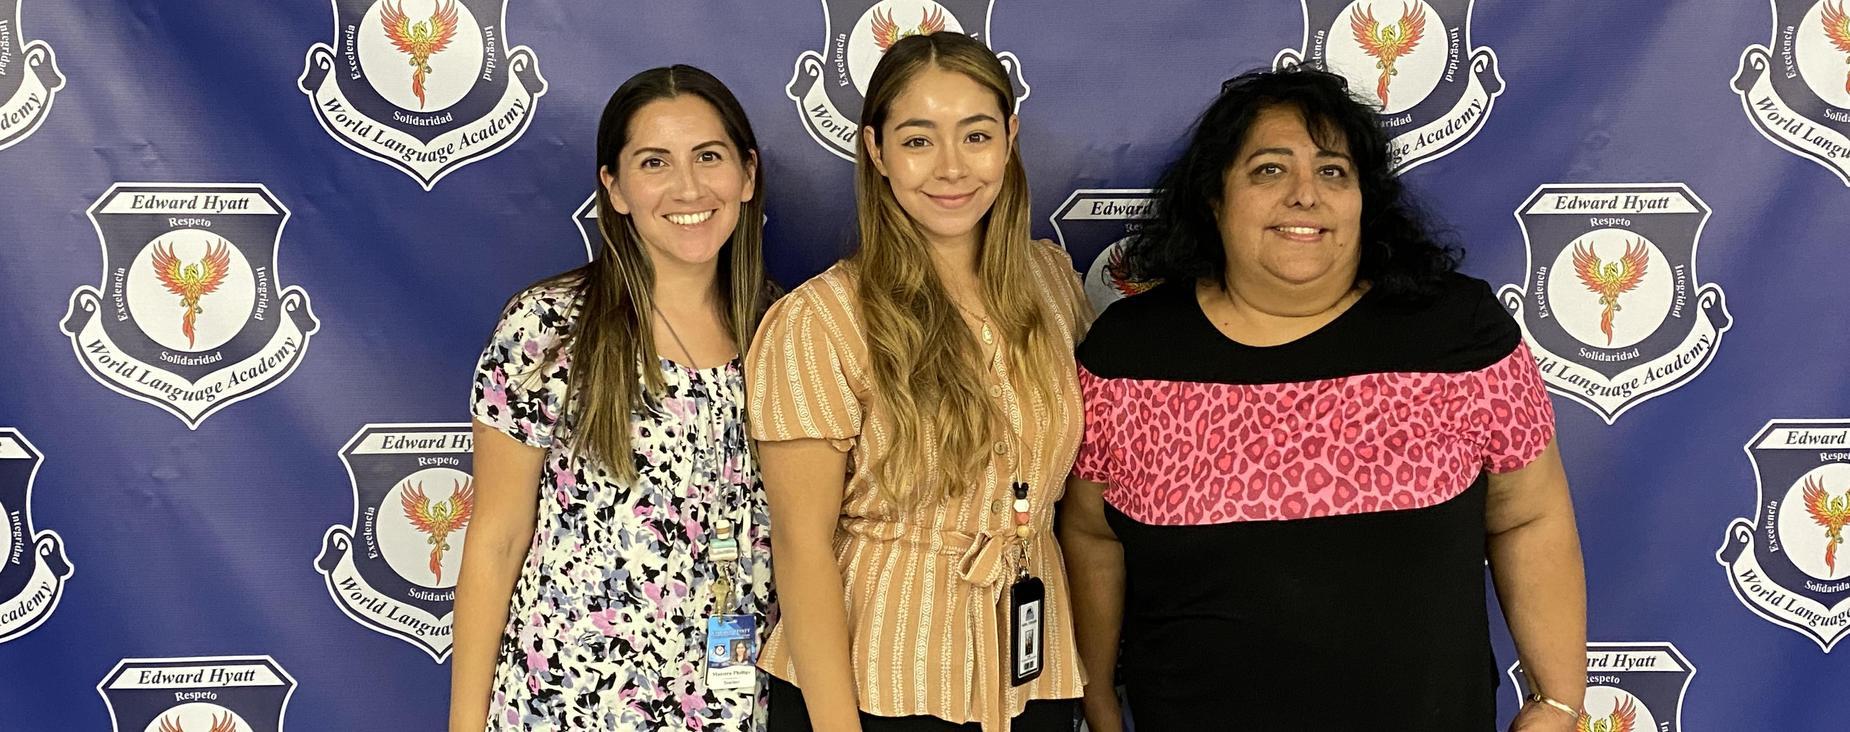 3 women standing